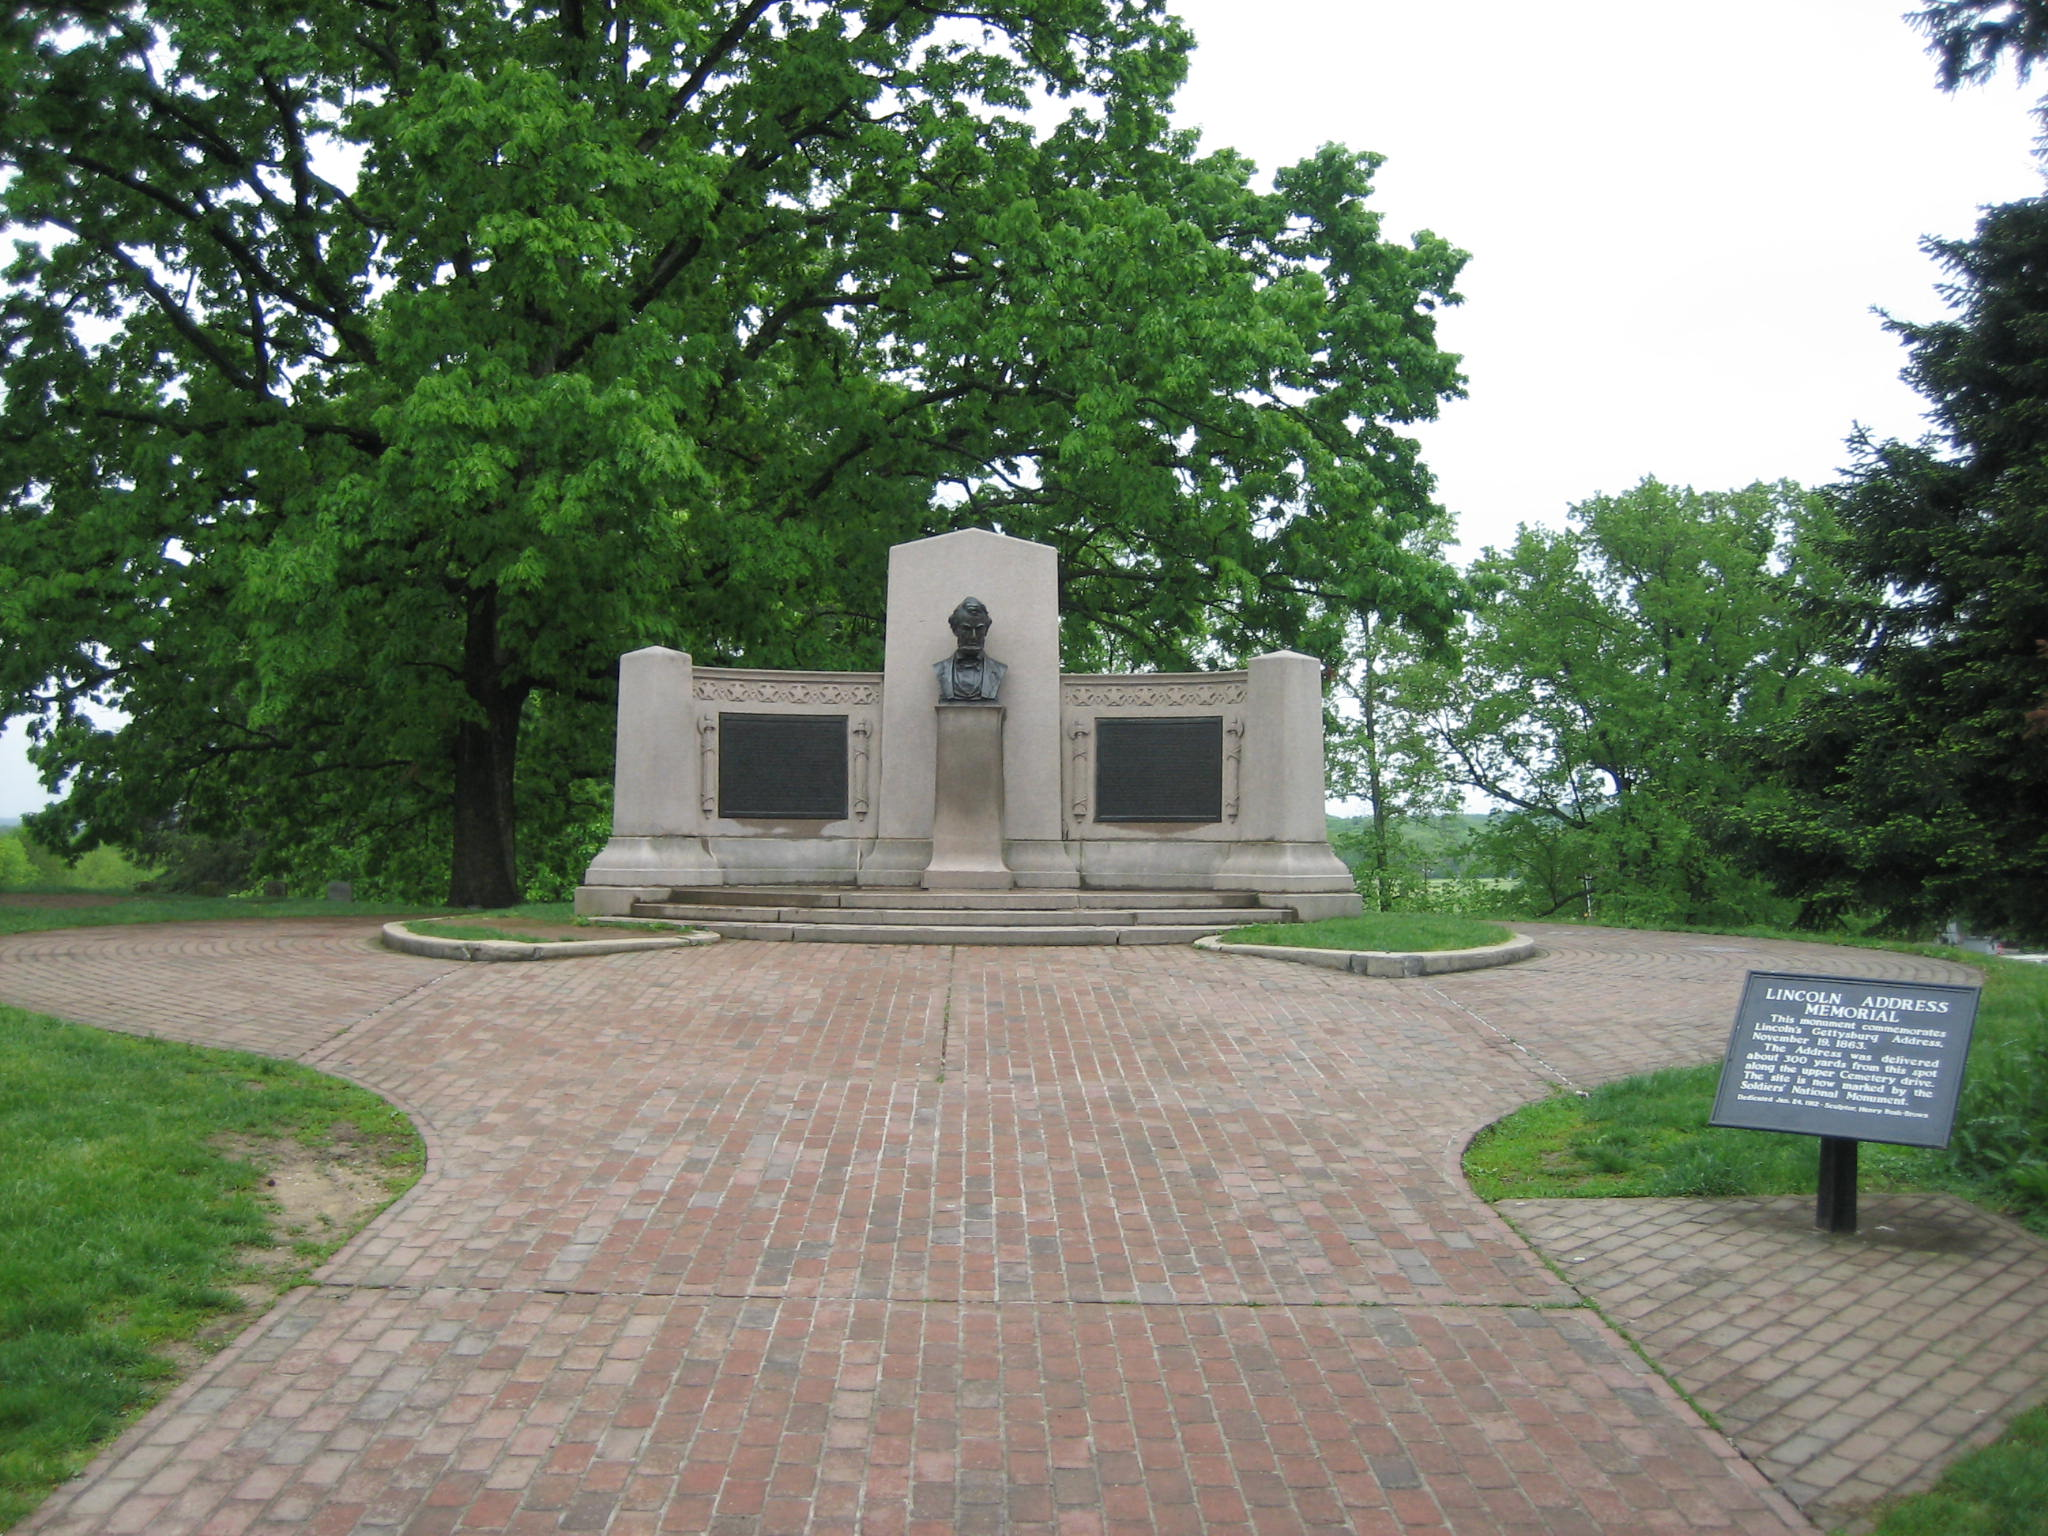 The Confusing Gettysburg Address Memorial